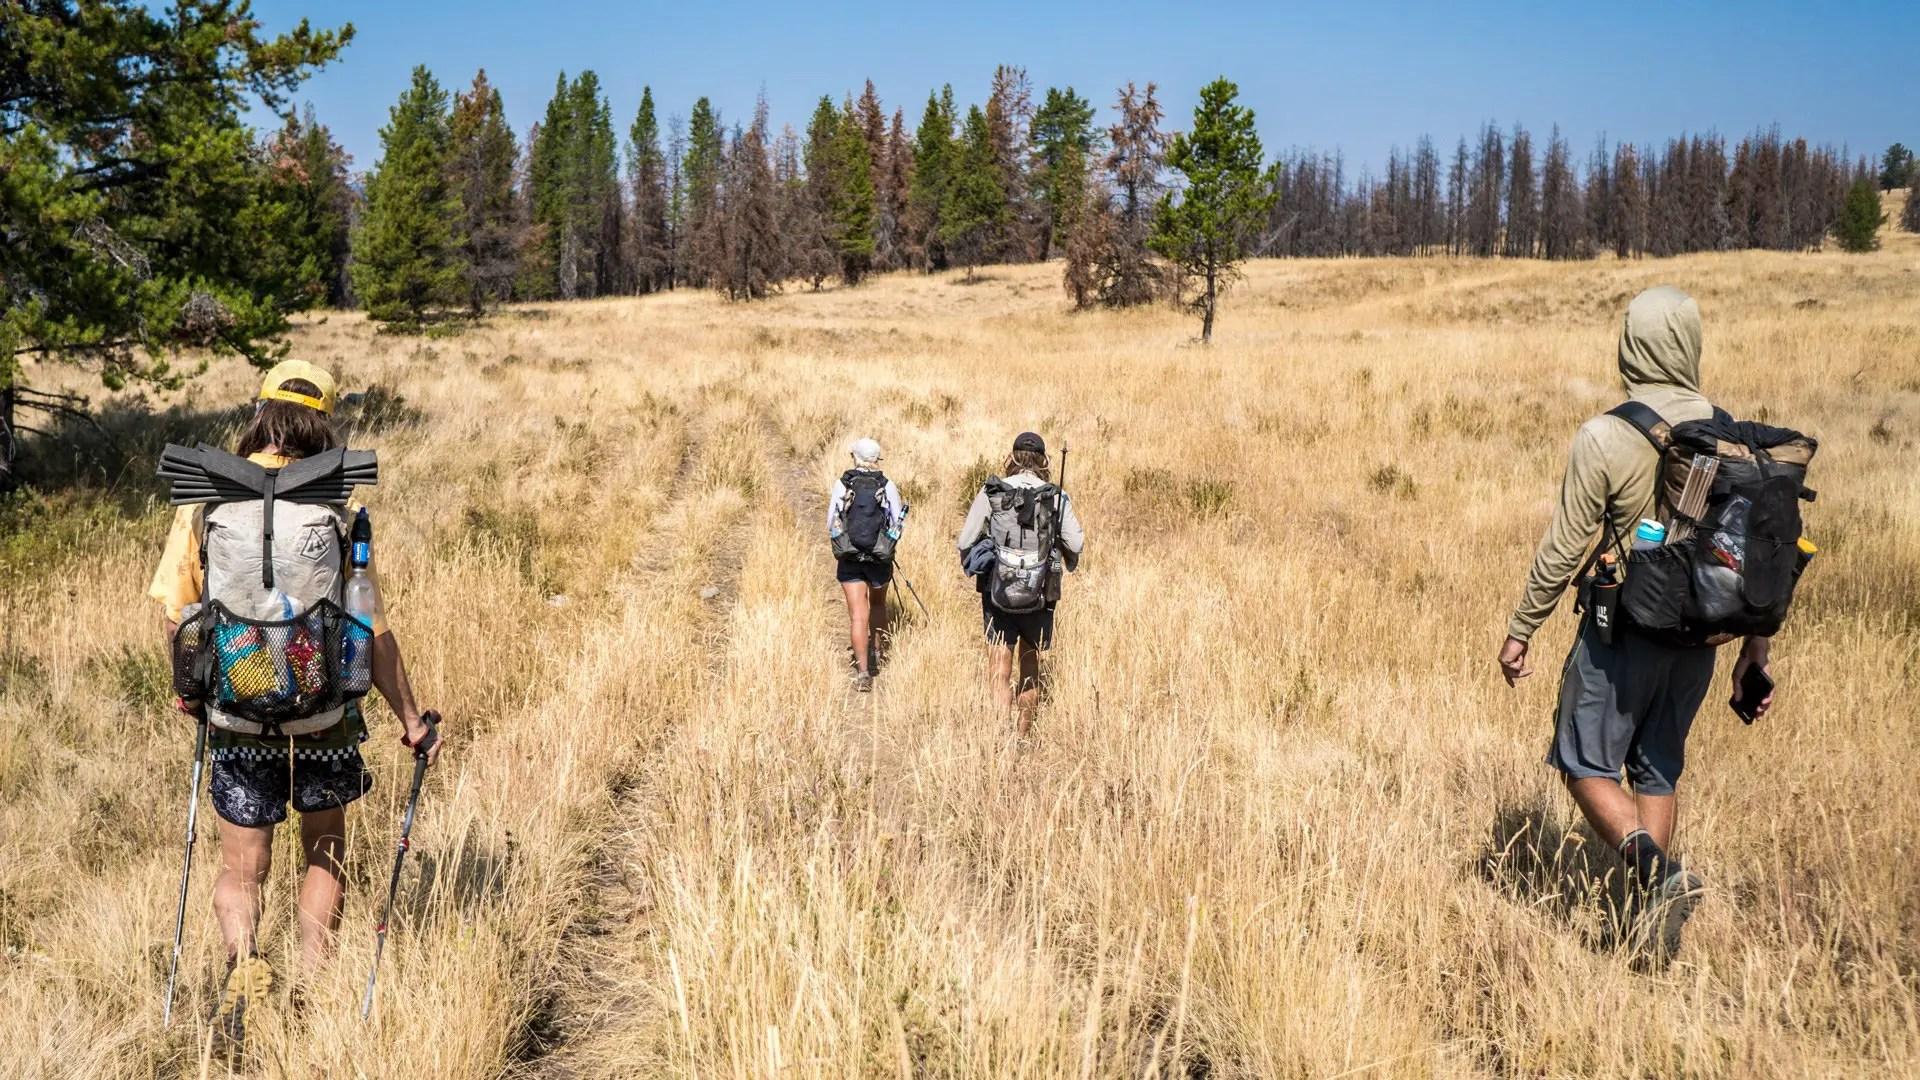 CDT Montana Thru-hikers